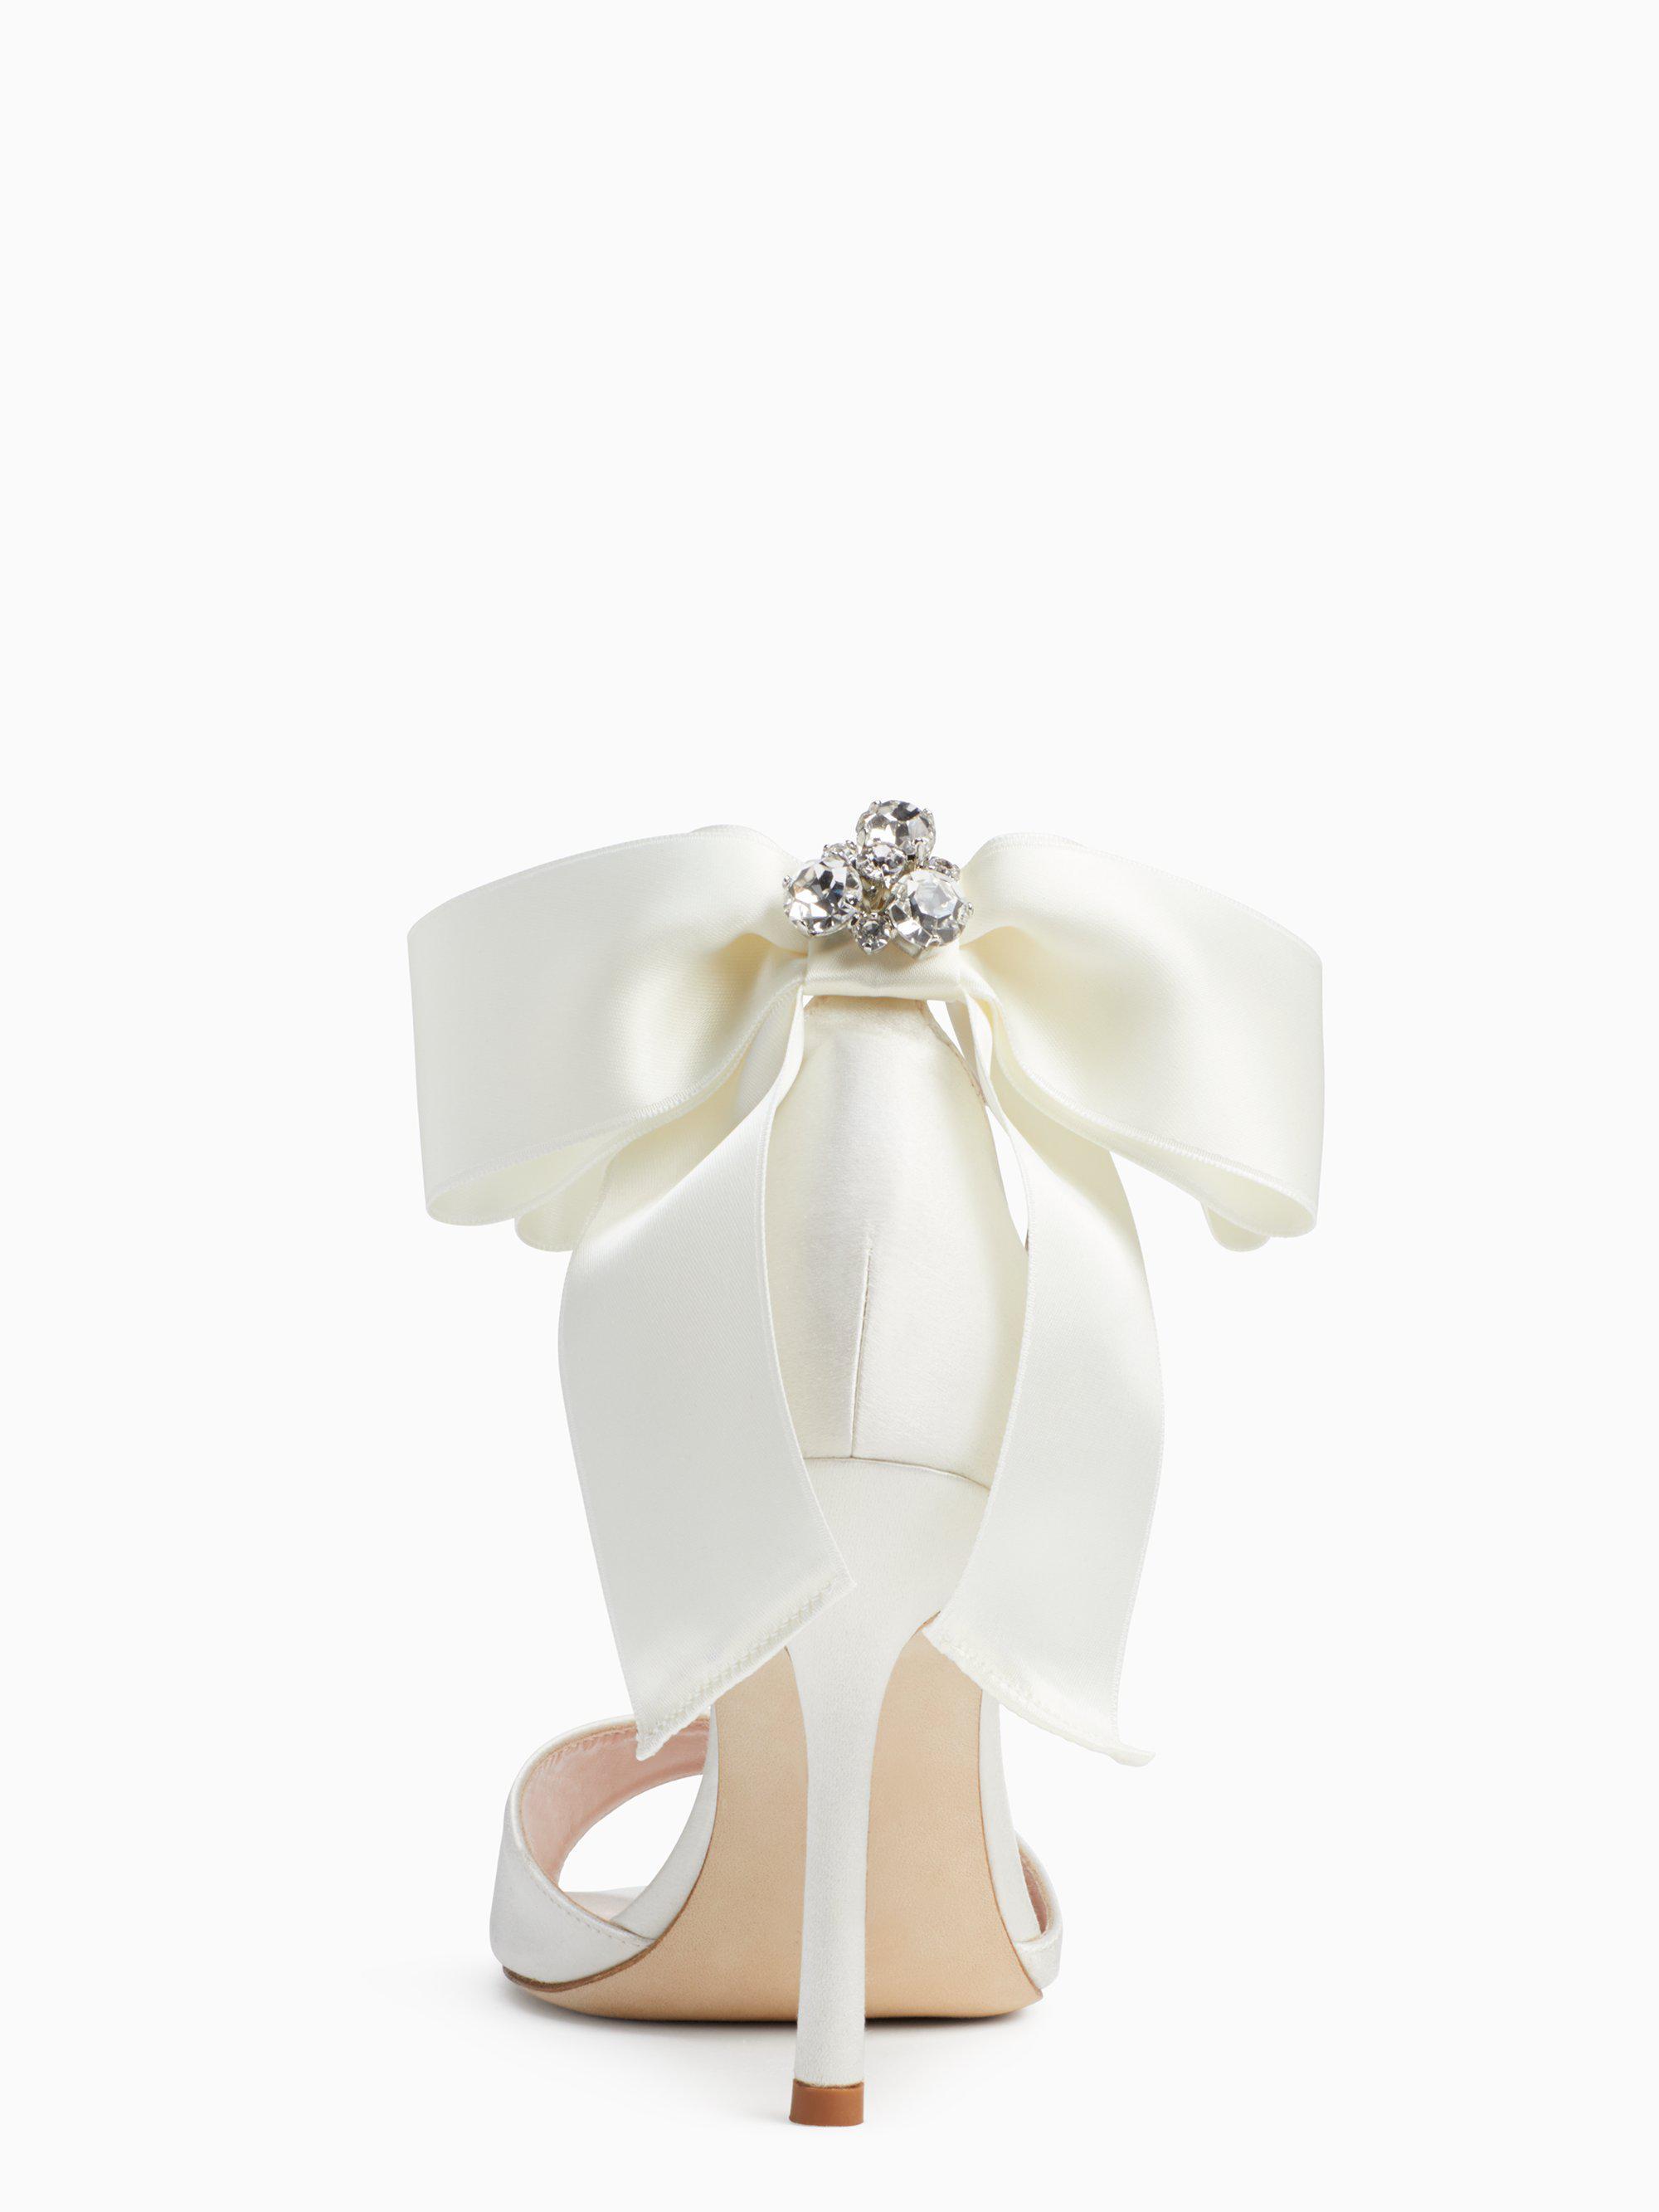 697a527780f3 Lyst - Kate Spade Ilise Heels in White